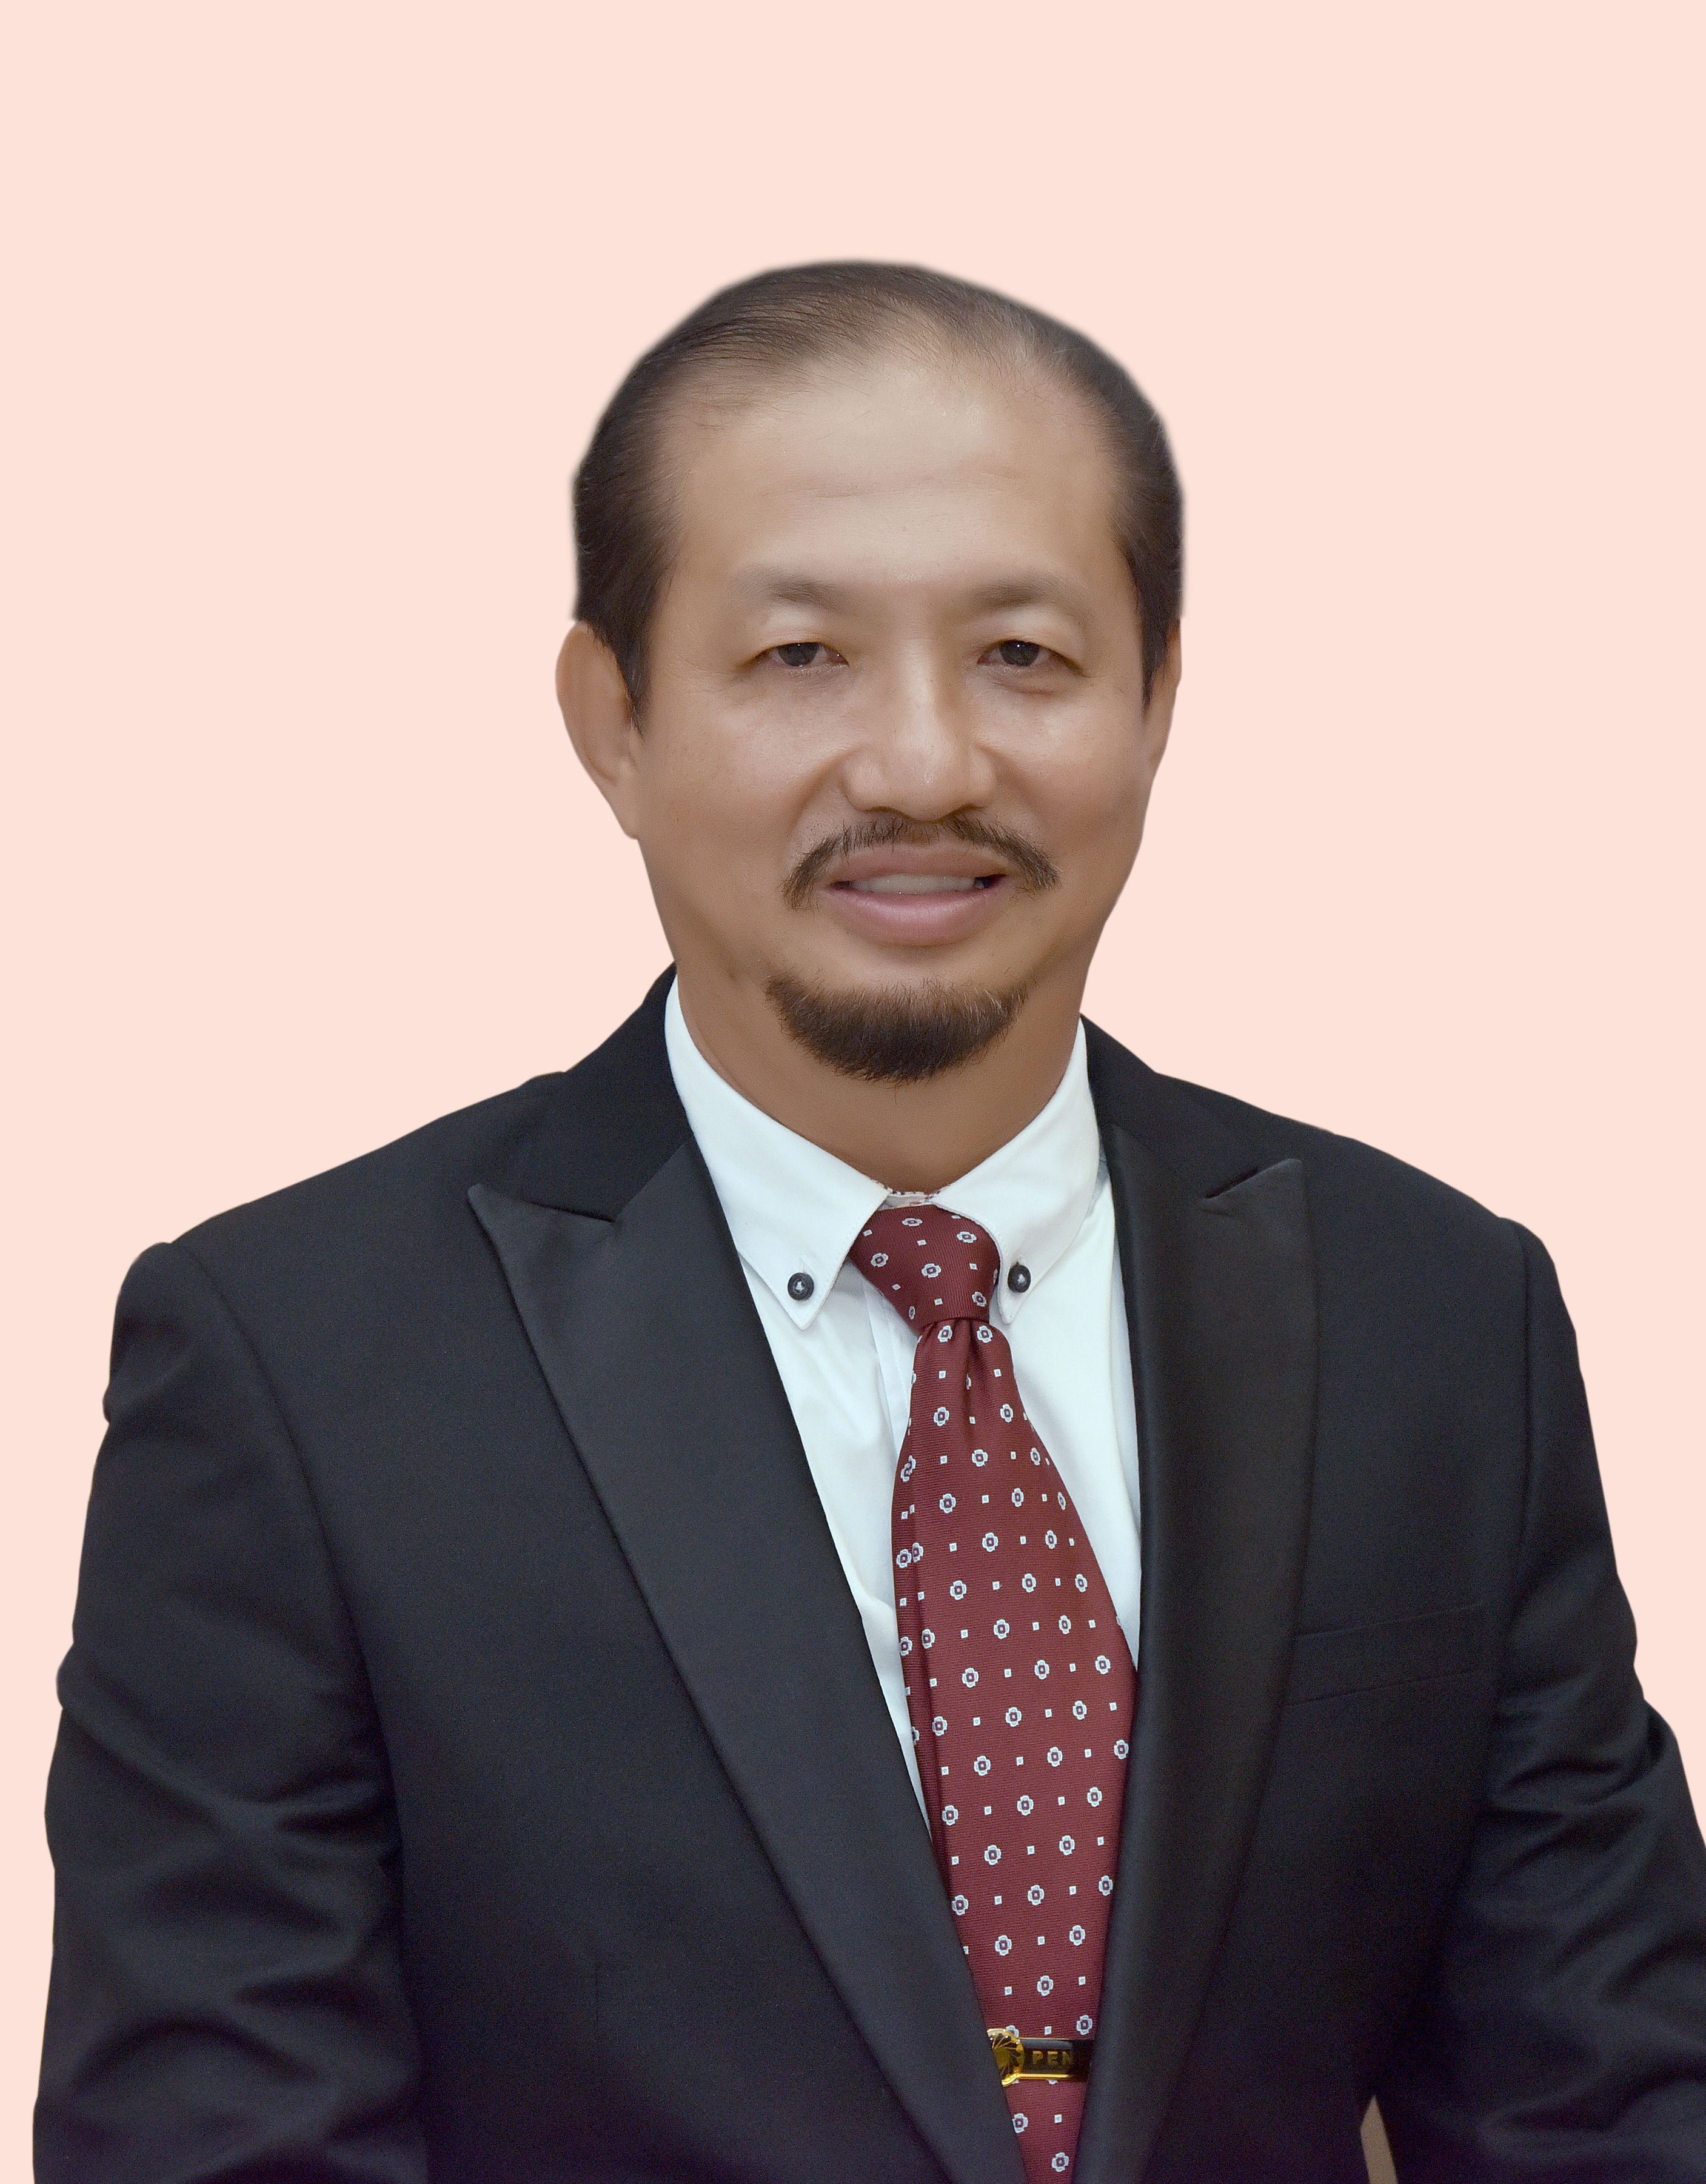 <h80>拿督黄才荣</h80><br>Dato' Ng Chai Eng